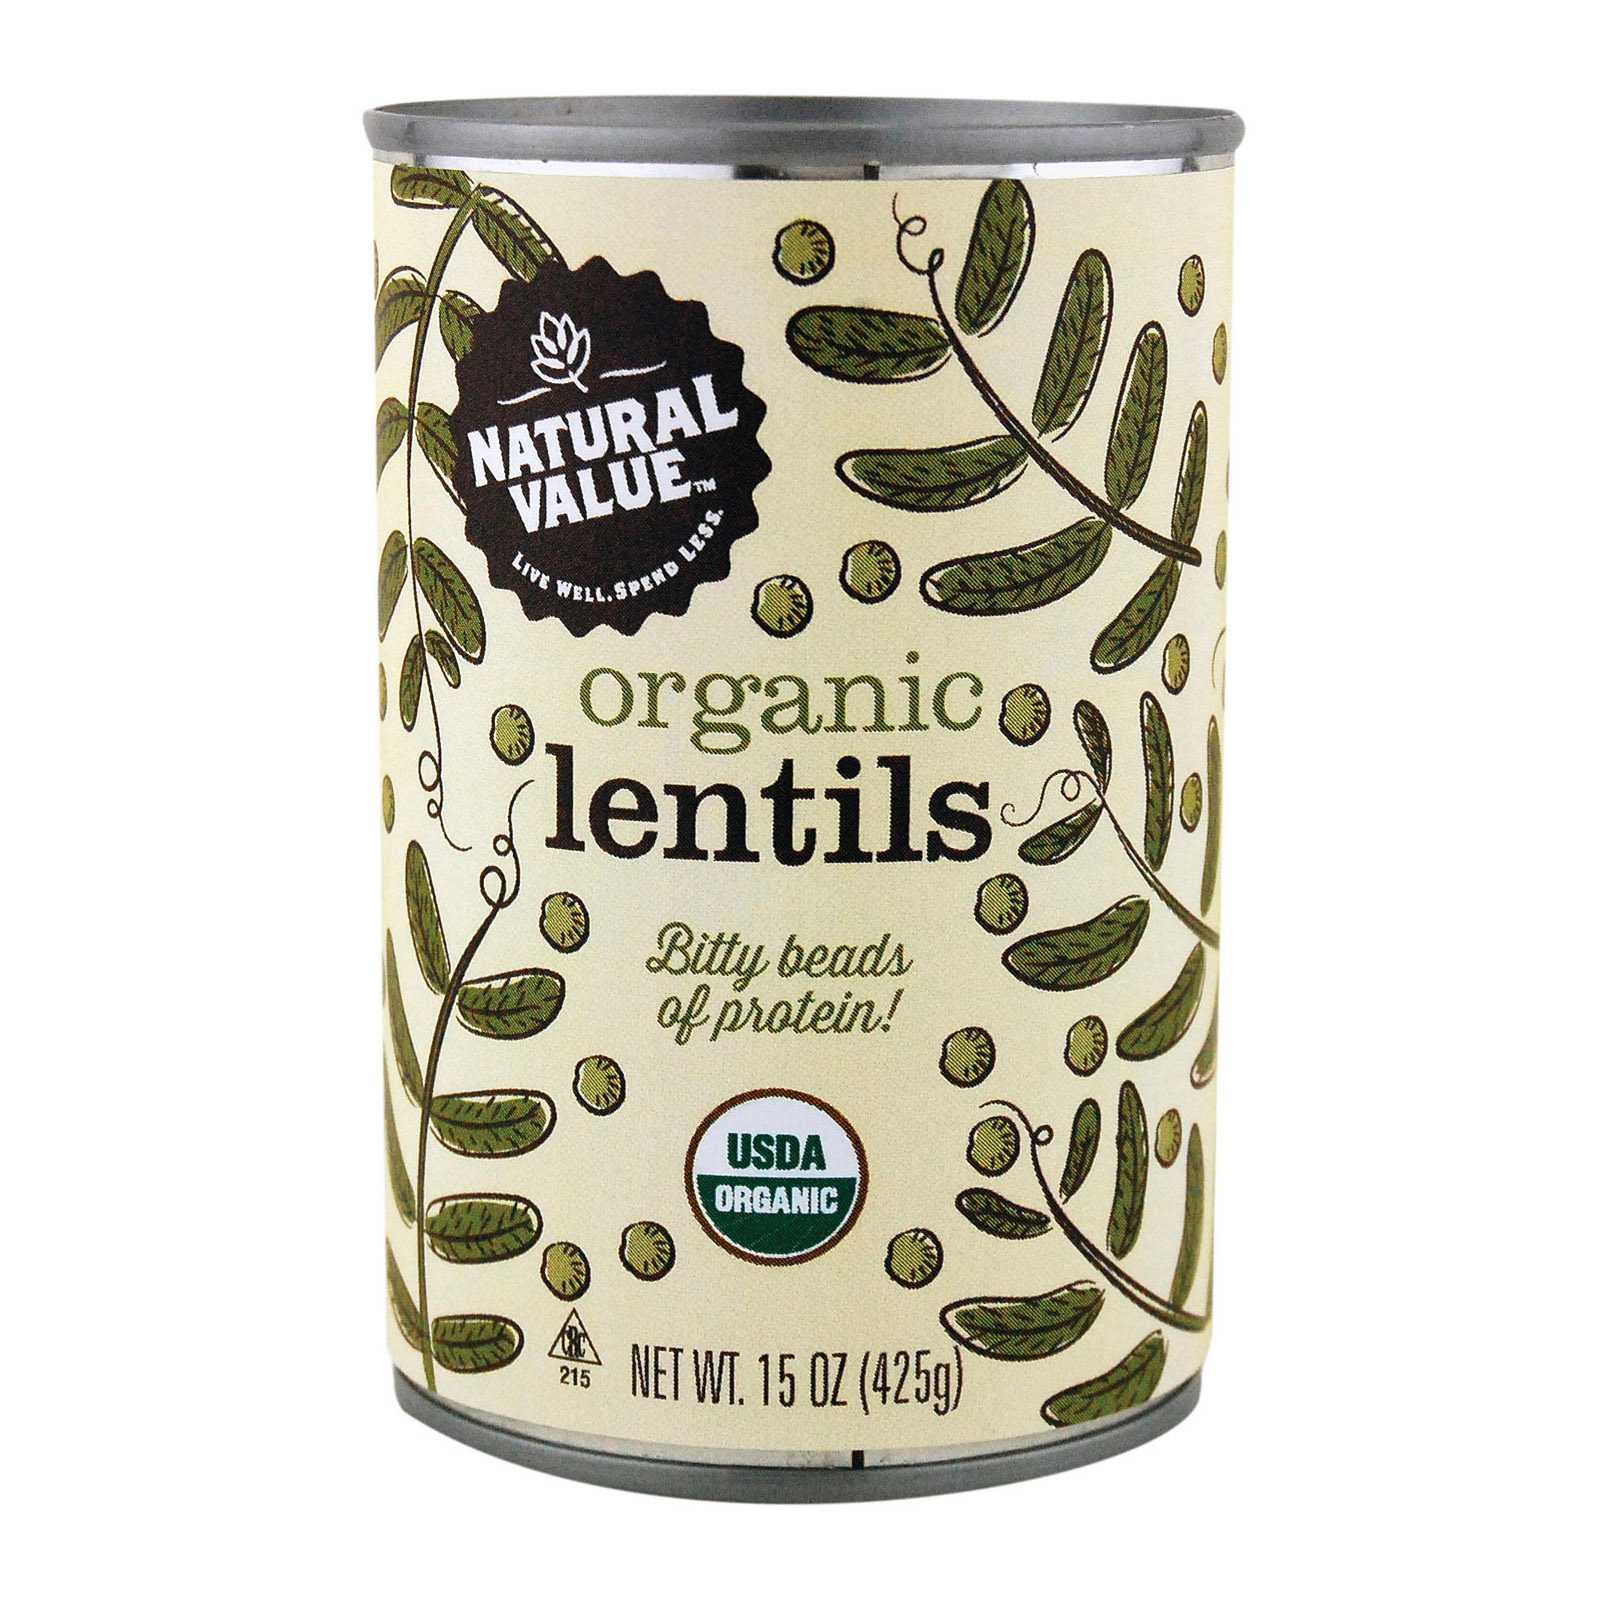 Natural Value Beans - Organic - Lentils - Case of 12 - 15 oz